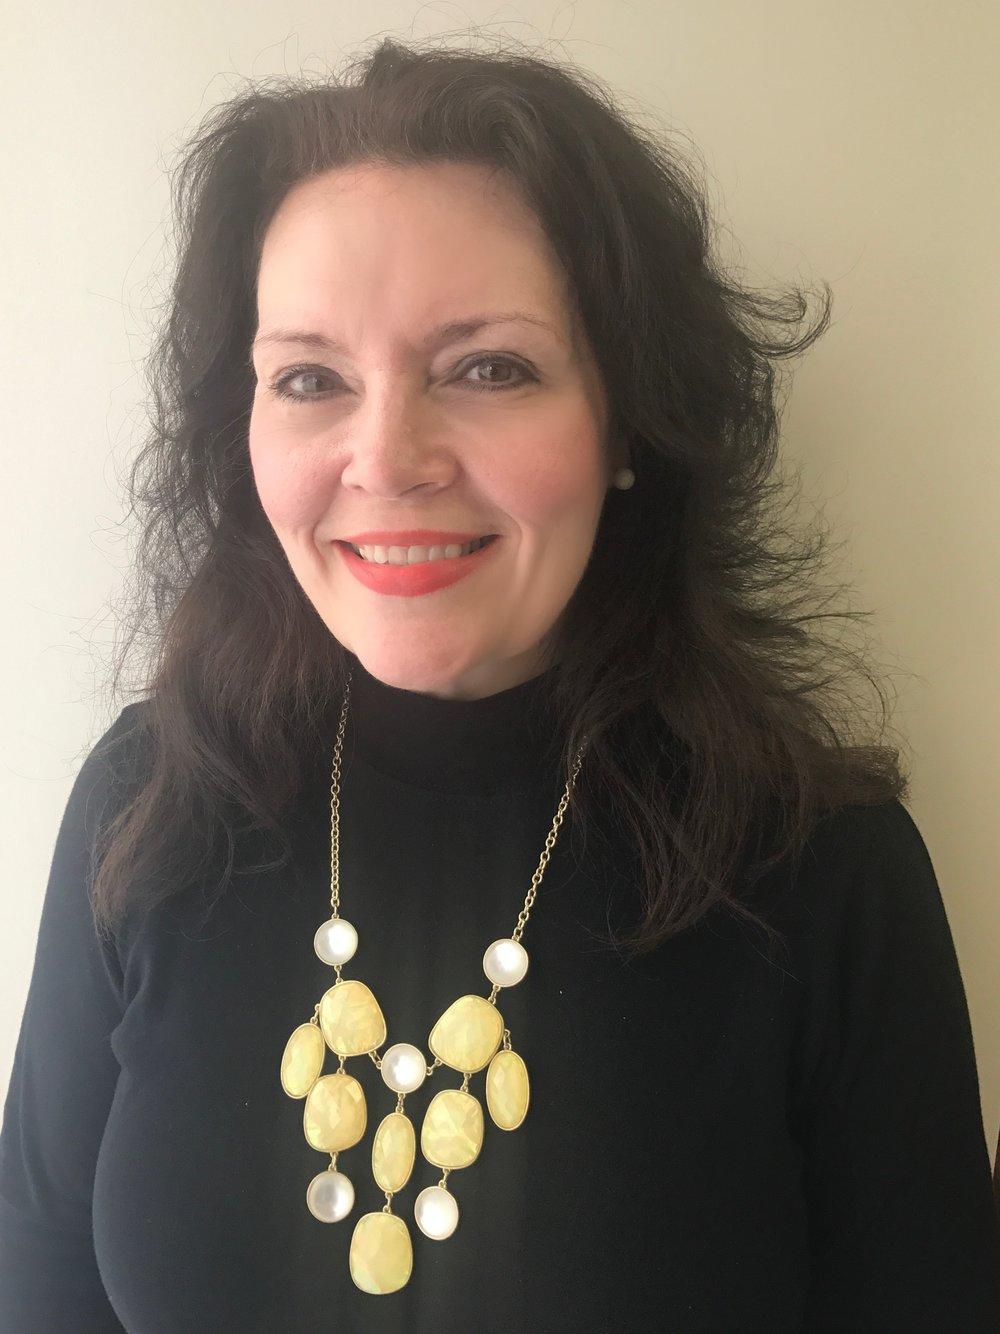 Tammie Melton  Secretary/Bookkeeper (843) 662-4021 / (843) 374-2641  flodisfoundsc@yahoo.com